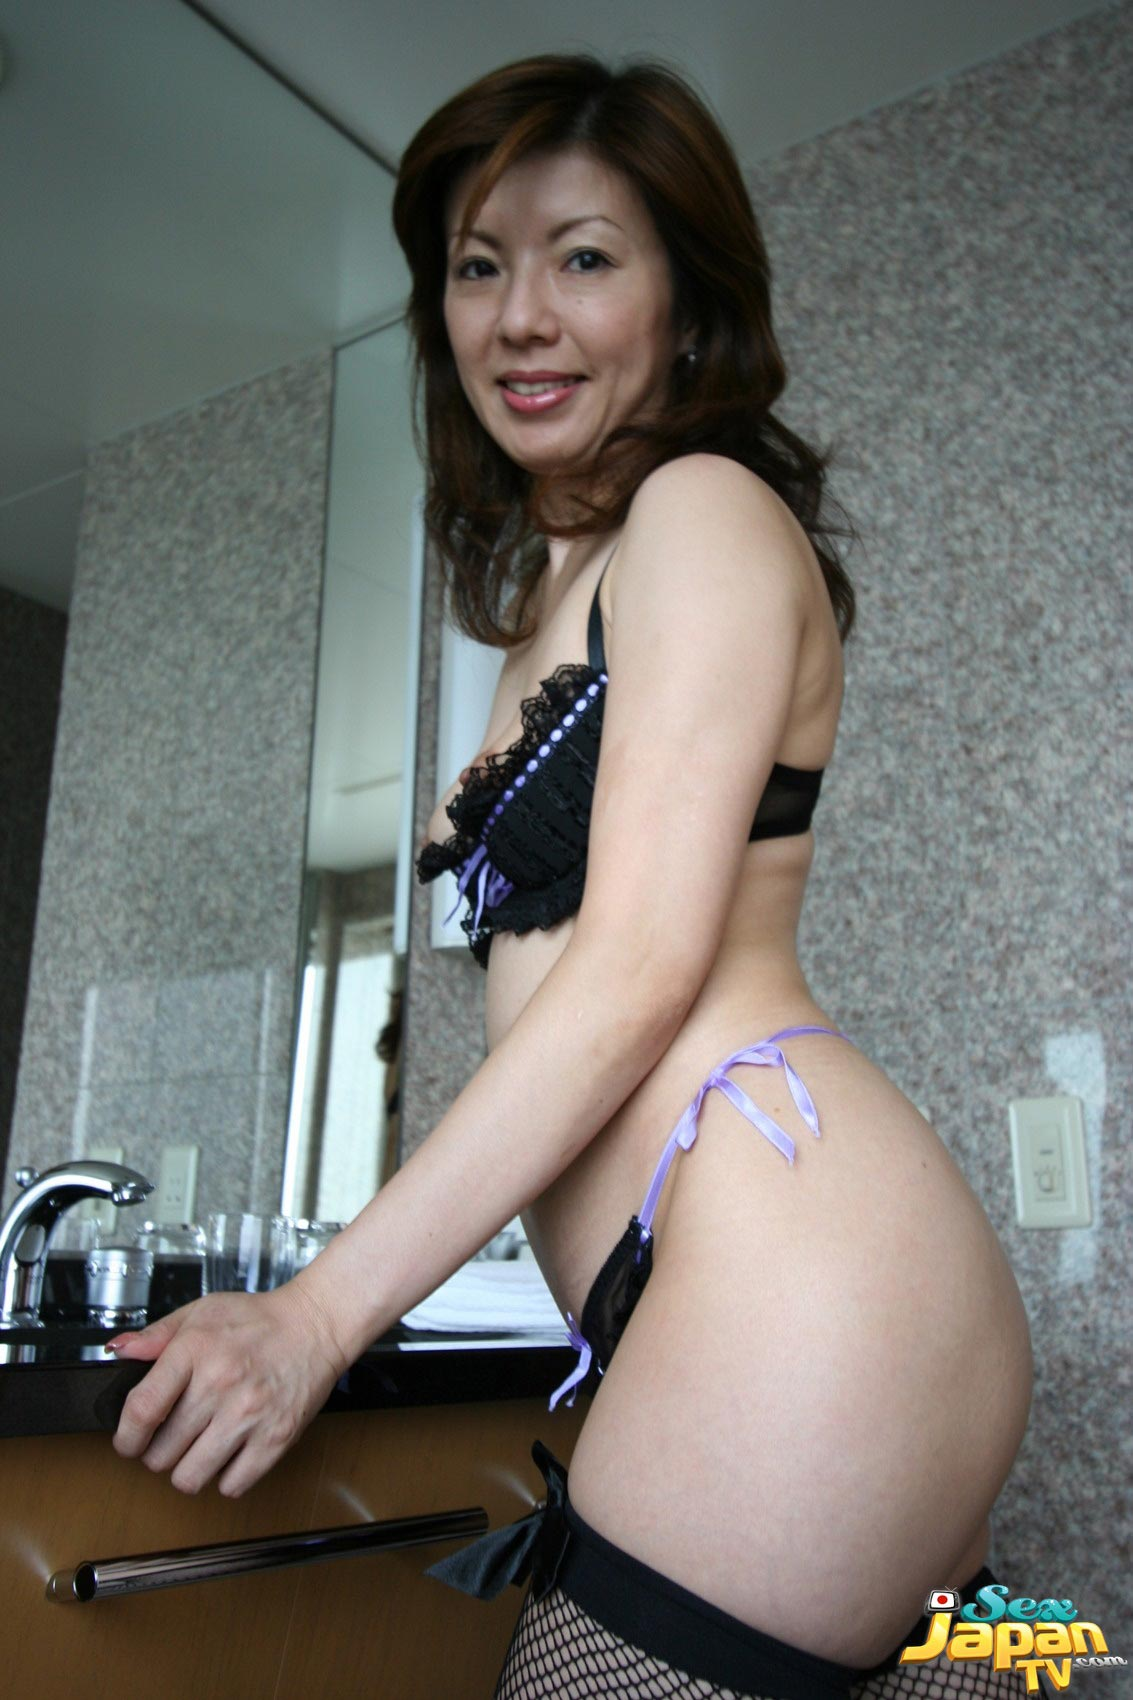 ... , panties and stockings, Miyuki Kobayashi is a sexy little Asian babe: japanfuckpics.com/410-in-her-black-bra-panties-and-stockings-miyuki...